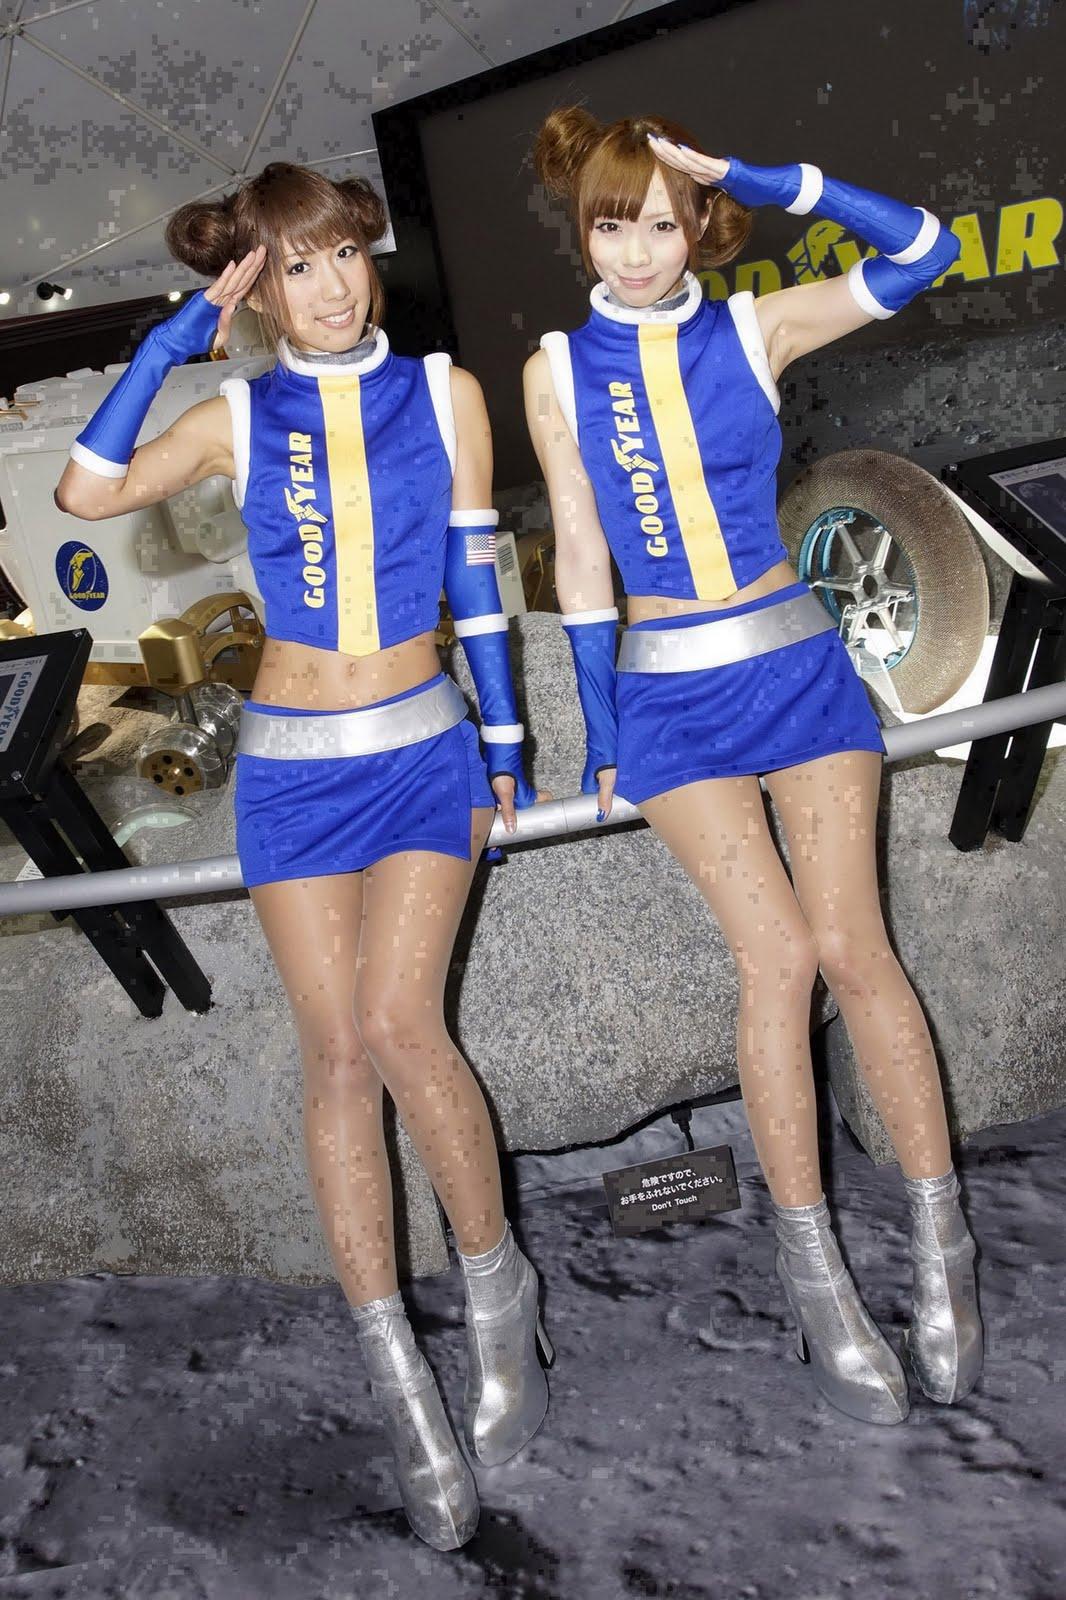 Шлюхи в токио 20 фотография